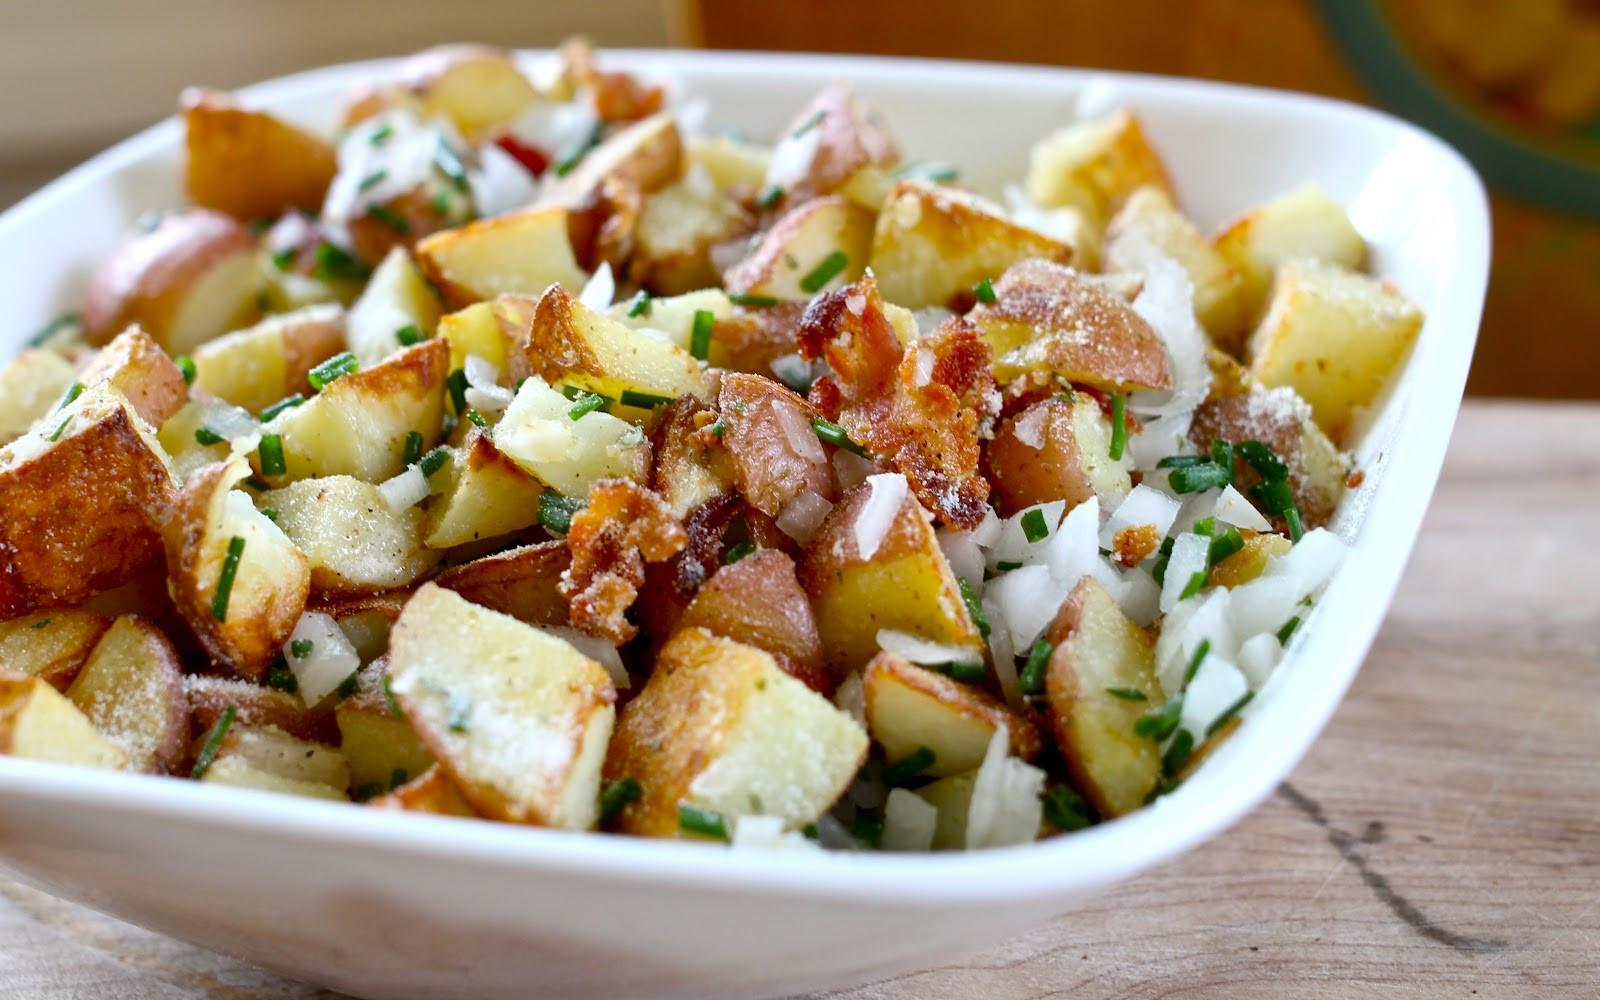 Roasted Potato Salad  Yammie s Noshery Roasted Bacon Ranch Potato Salad